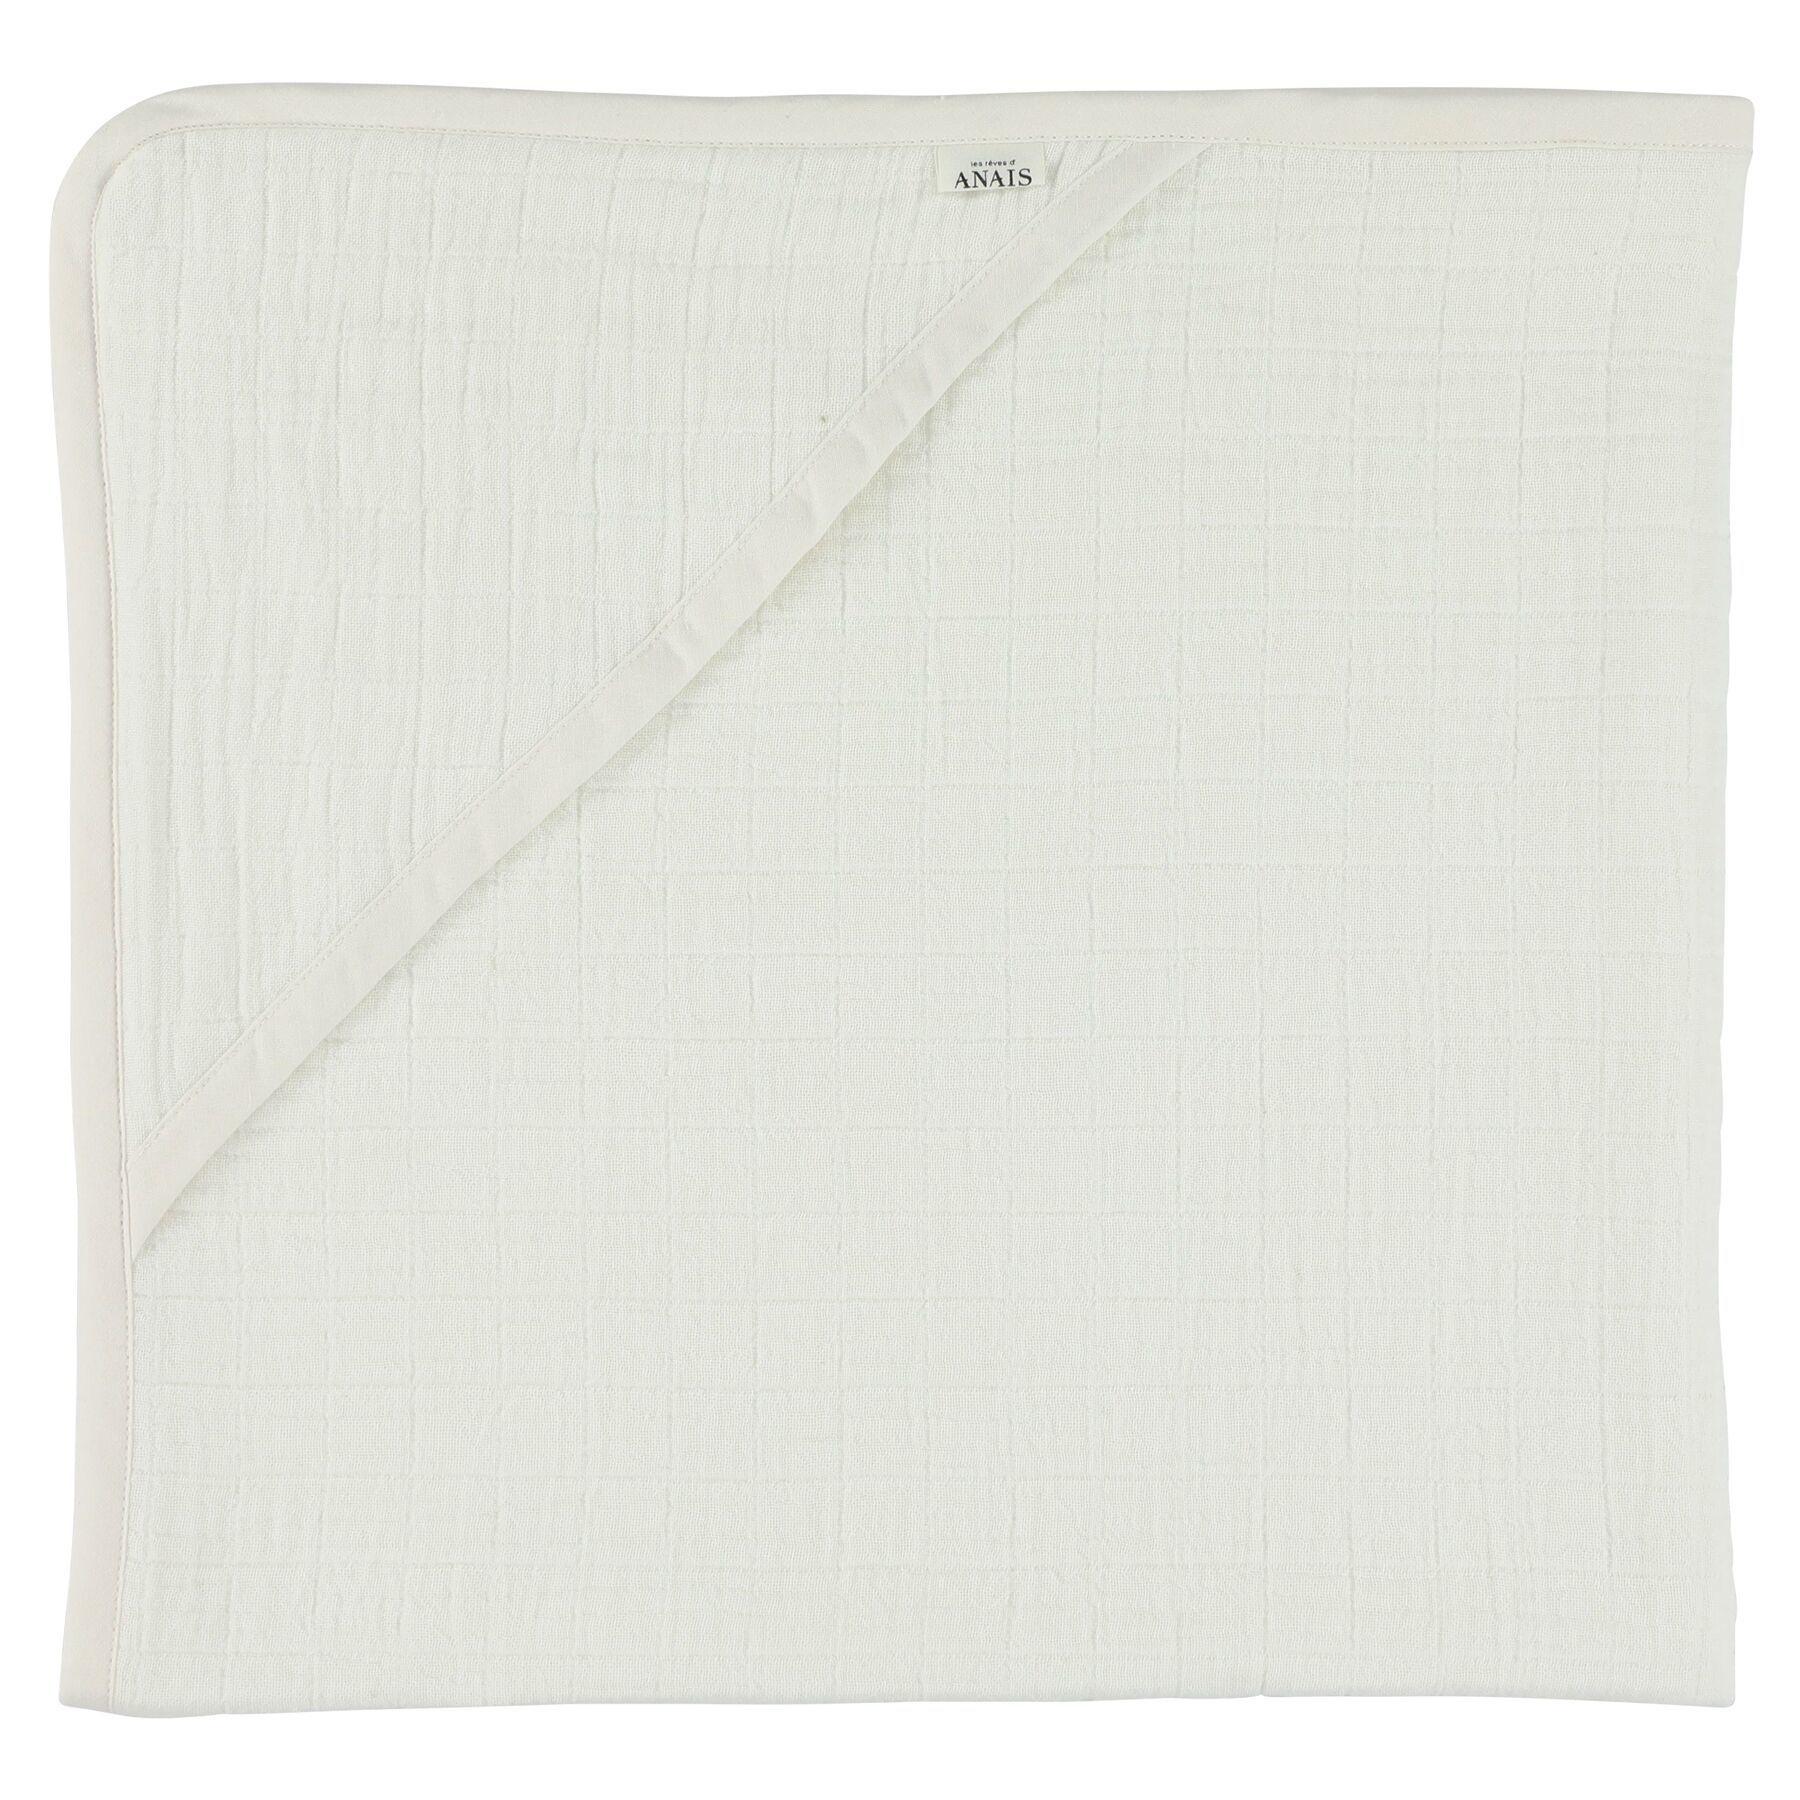 Les Rêves d'Anais Hooded Towel Bliss White